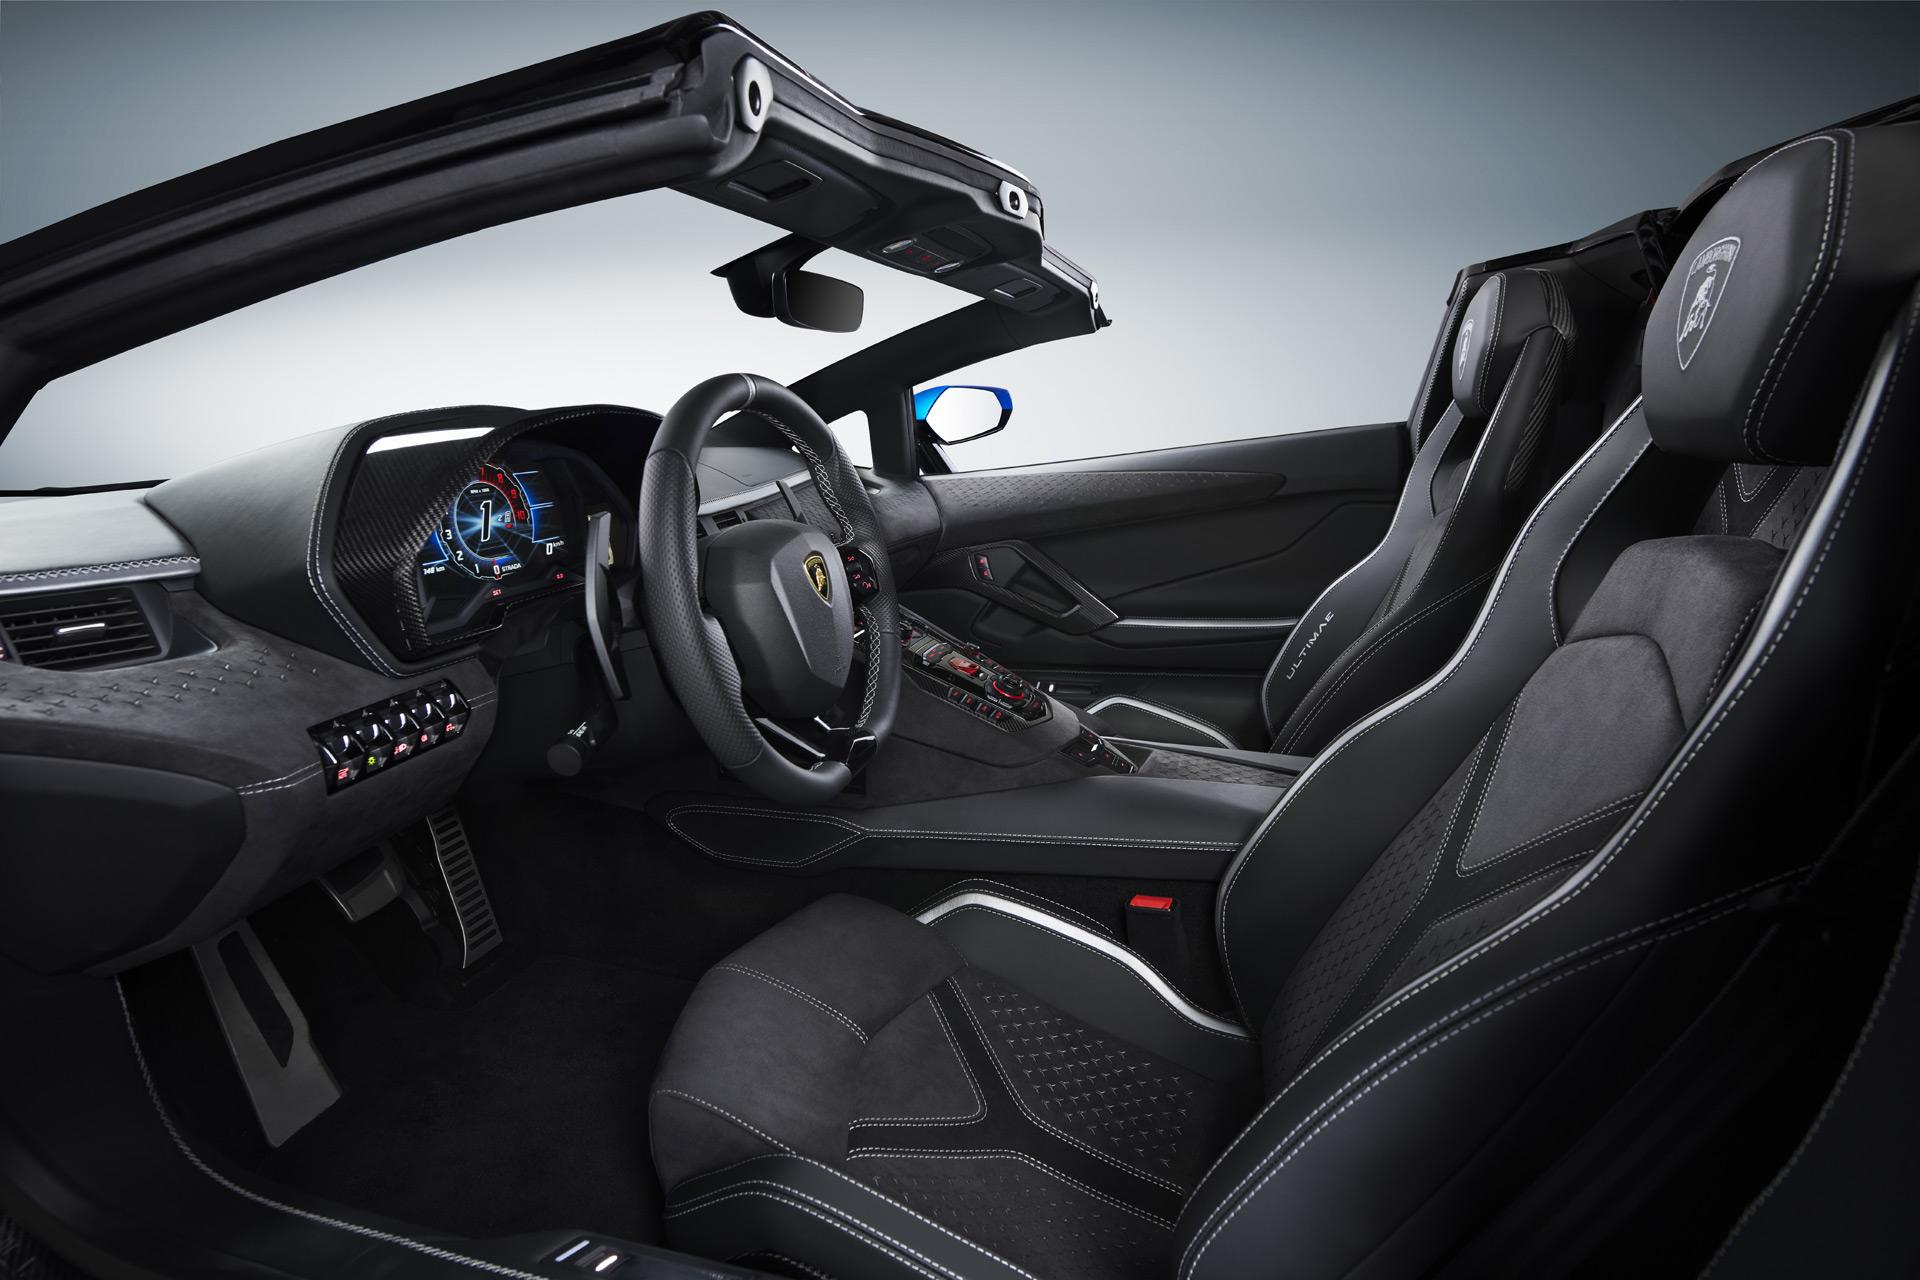 Lamborghini Aventador LP780-4 Ultimae 4